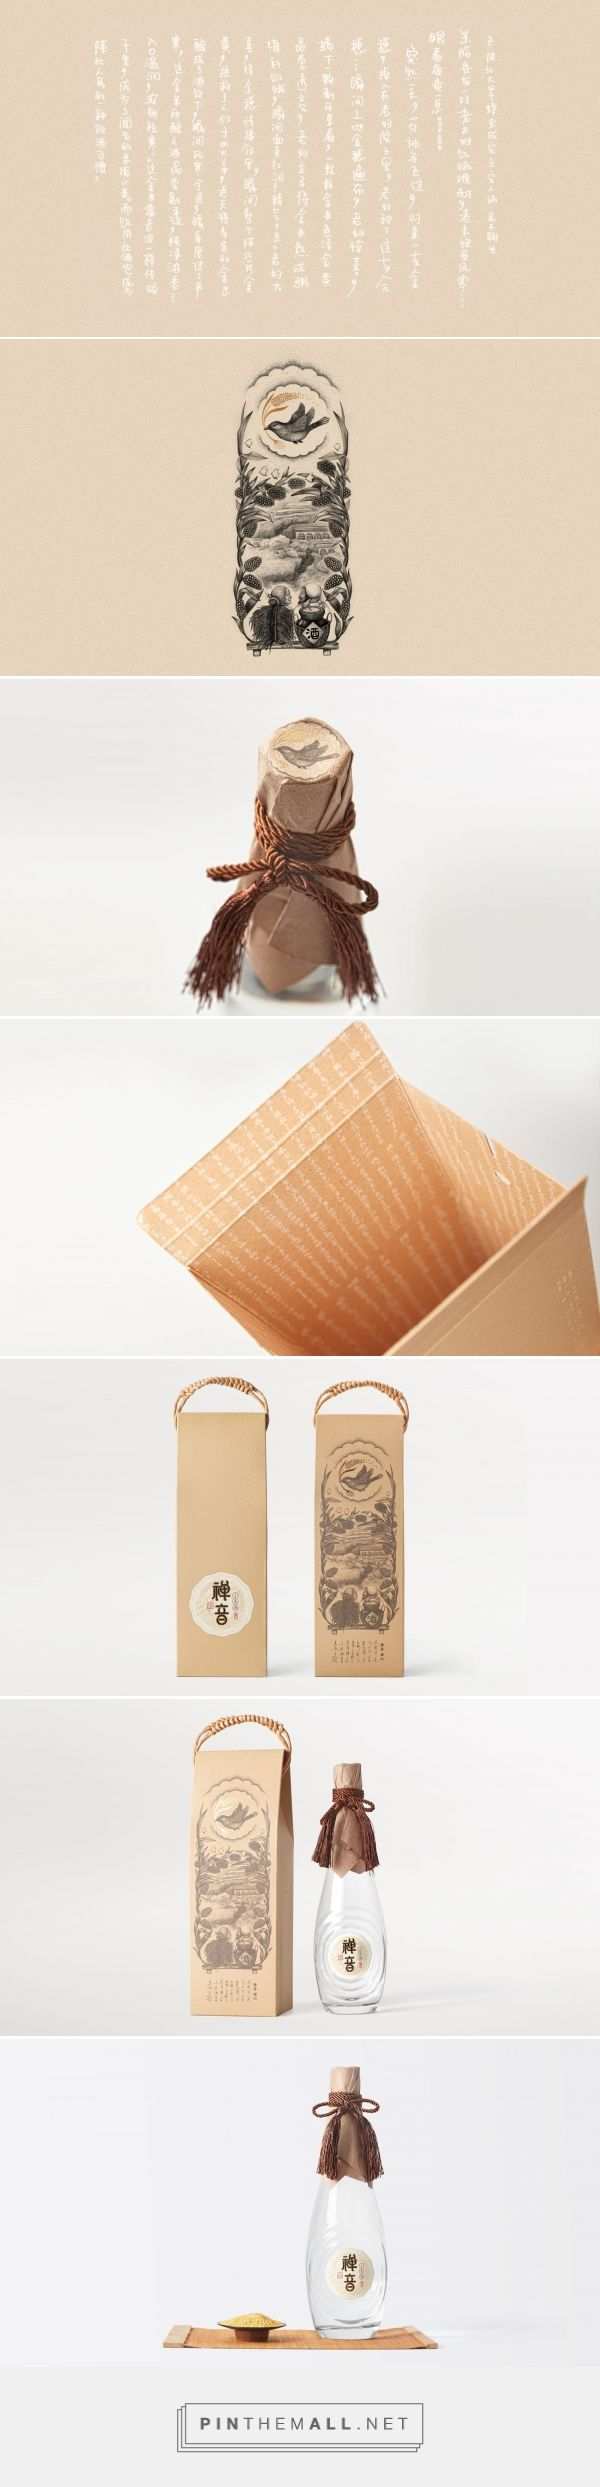 Chanyin Millet Wine packaging design by Lingyun Creative - http://www.packagingoftheworld.com/2017/06/chanyin-millet-wine.html - created via https://pinthemall.net